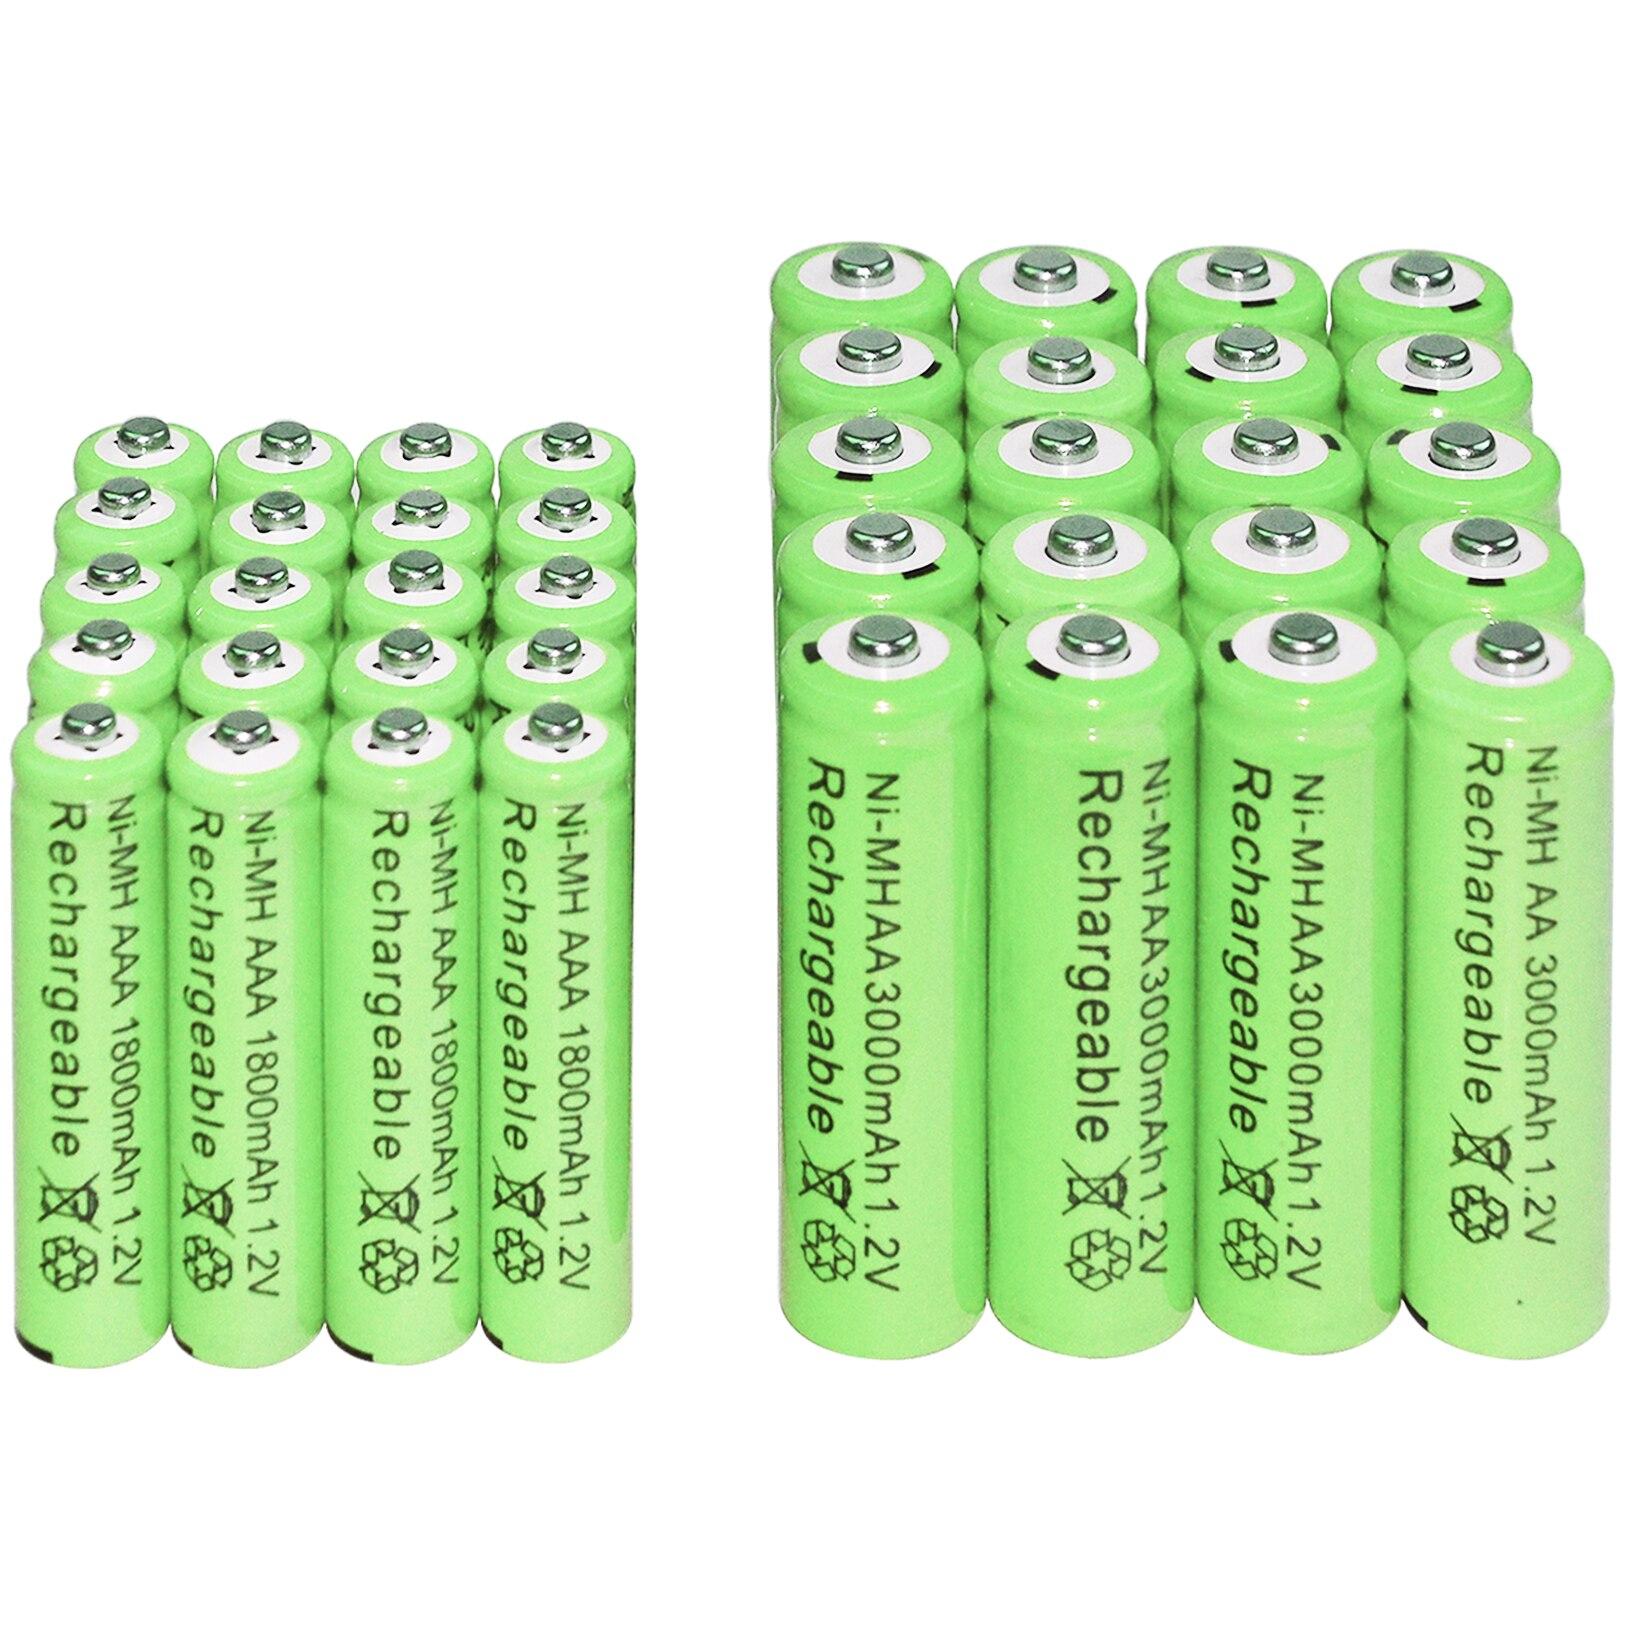 2/6/12/16/20/24/30pcs AAA 1800mAh + AA 3000mAh 1.2v Ni-MH Rechargeable Batteries green